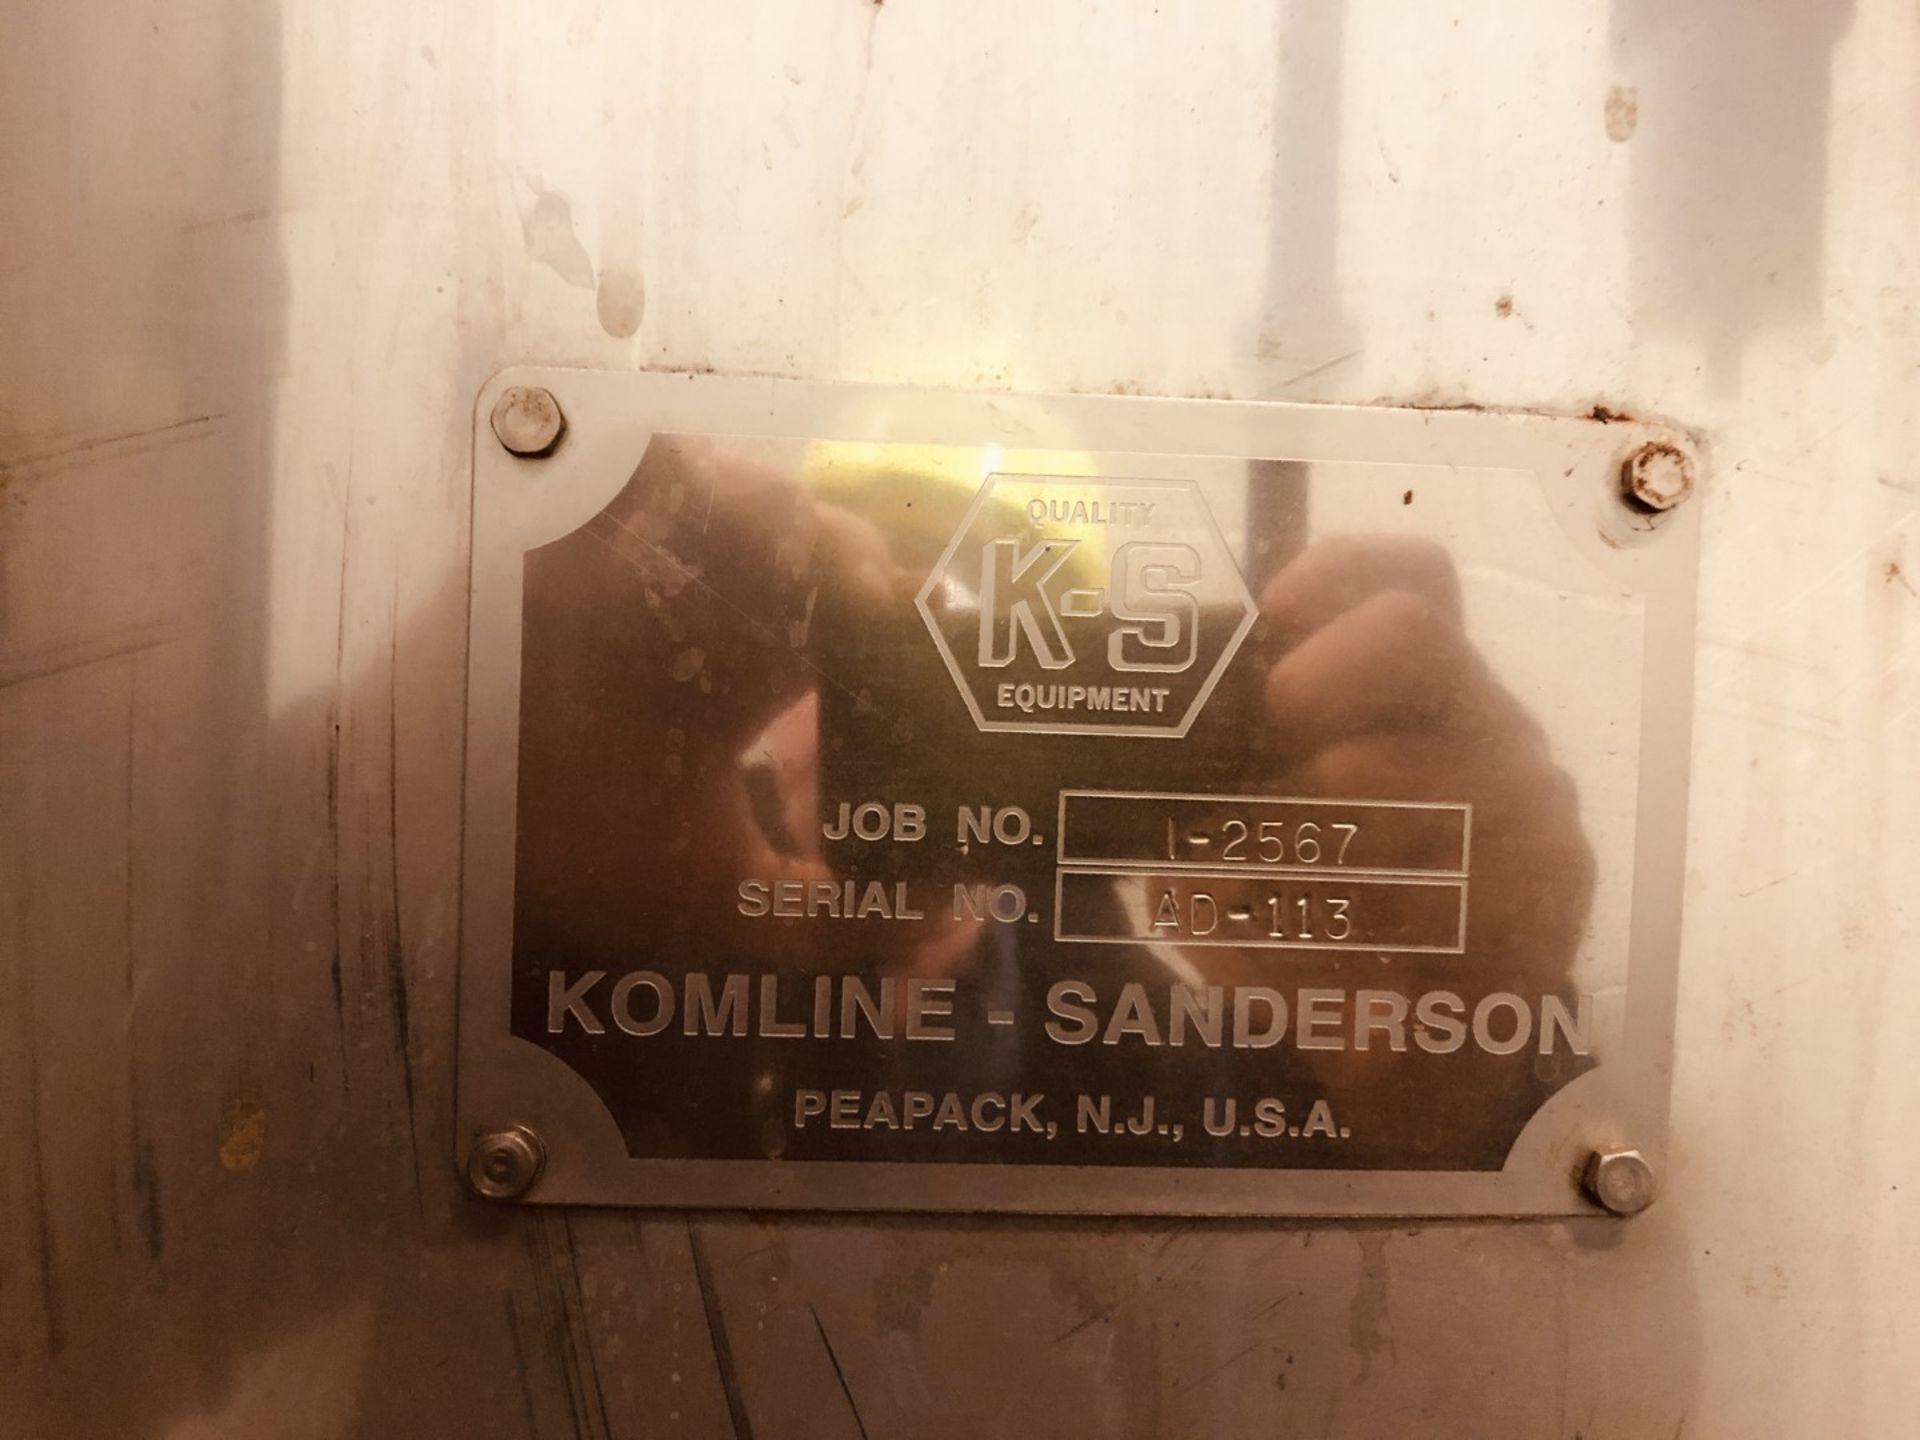 Komline Sanderson Model CIX HVF 1.25x9.75m 11.25 Sq Meter Horizontal Belt Vacuum Filter - Image 17 of 17